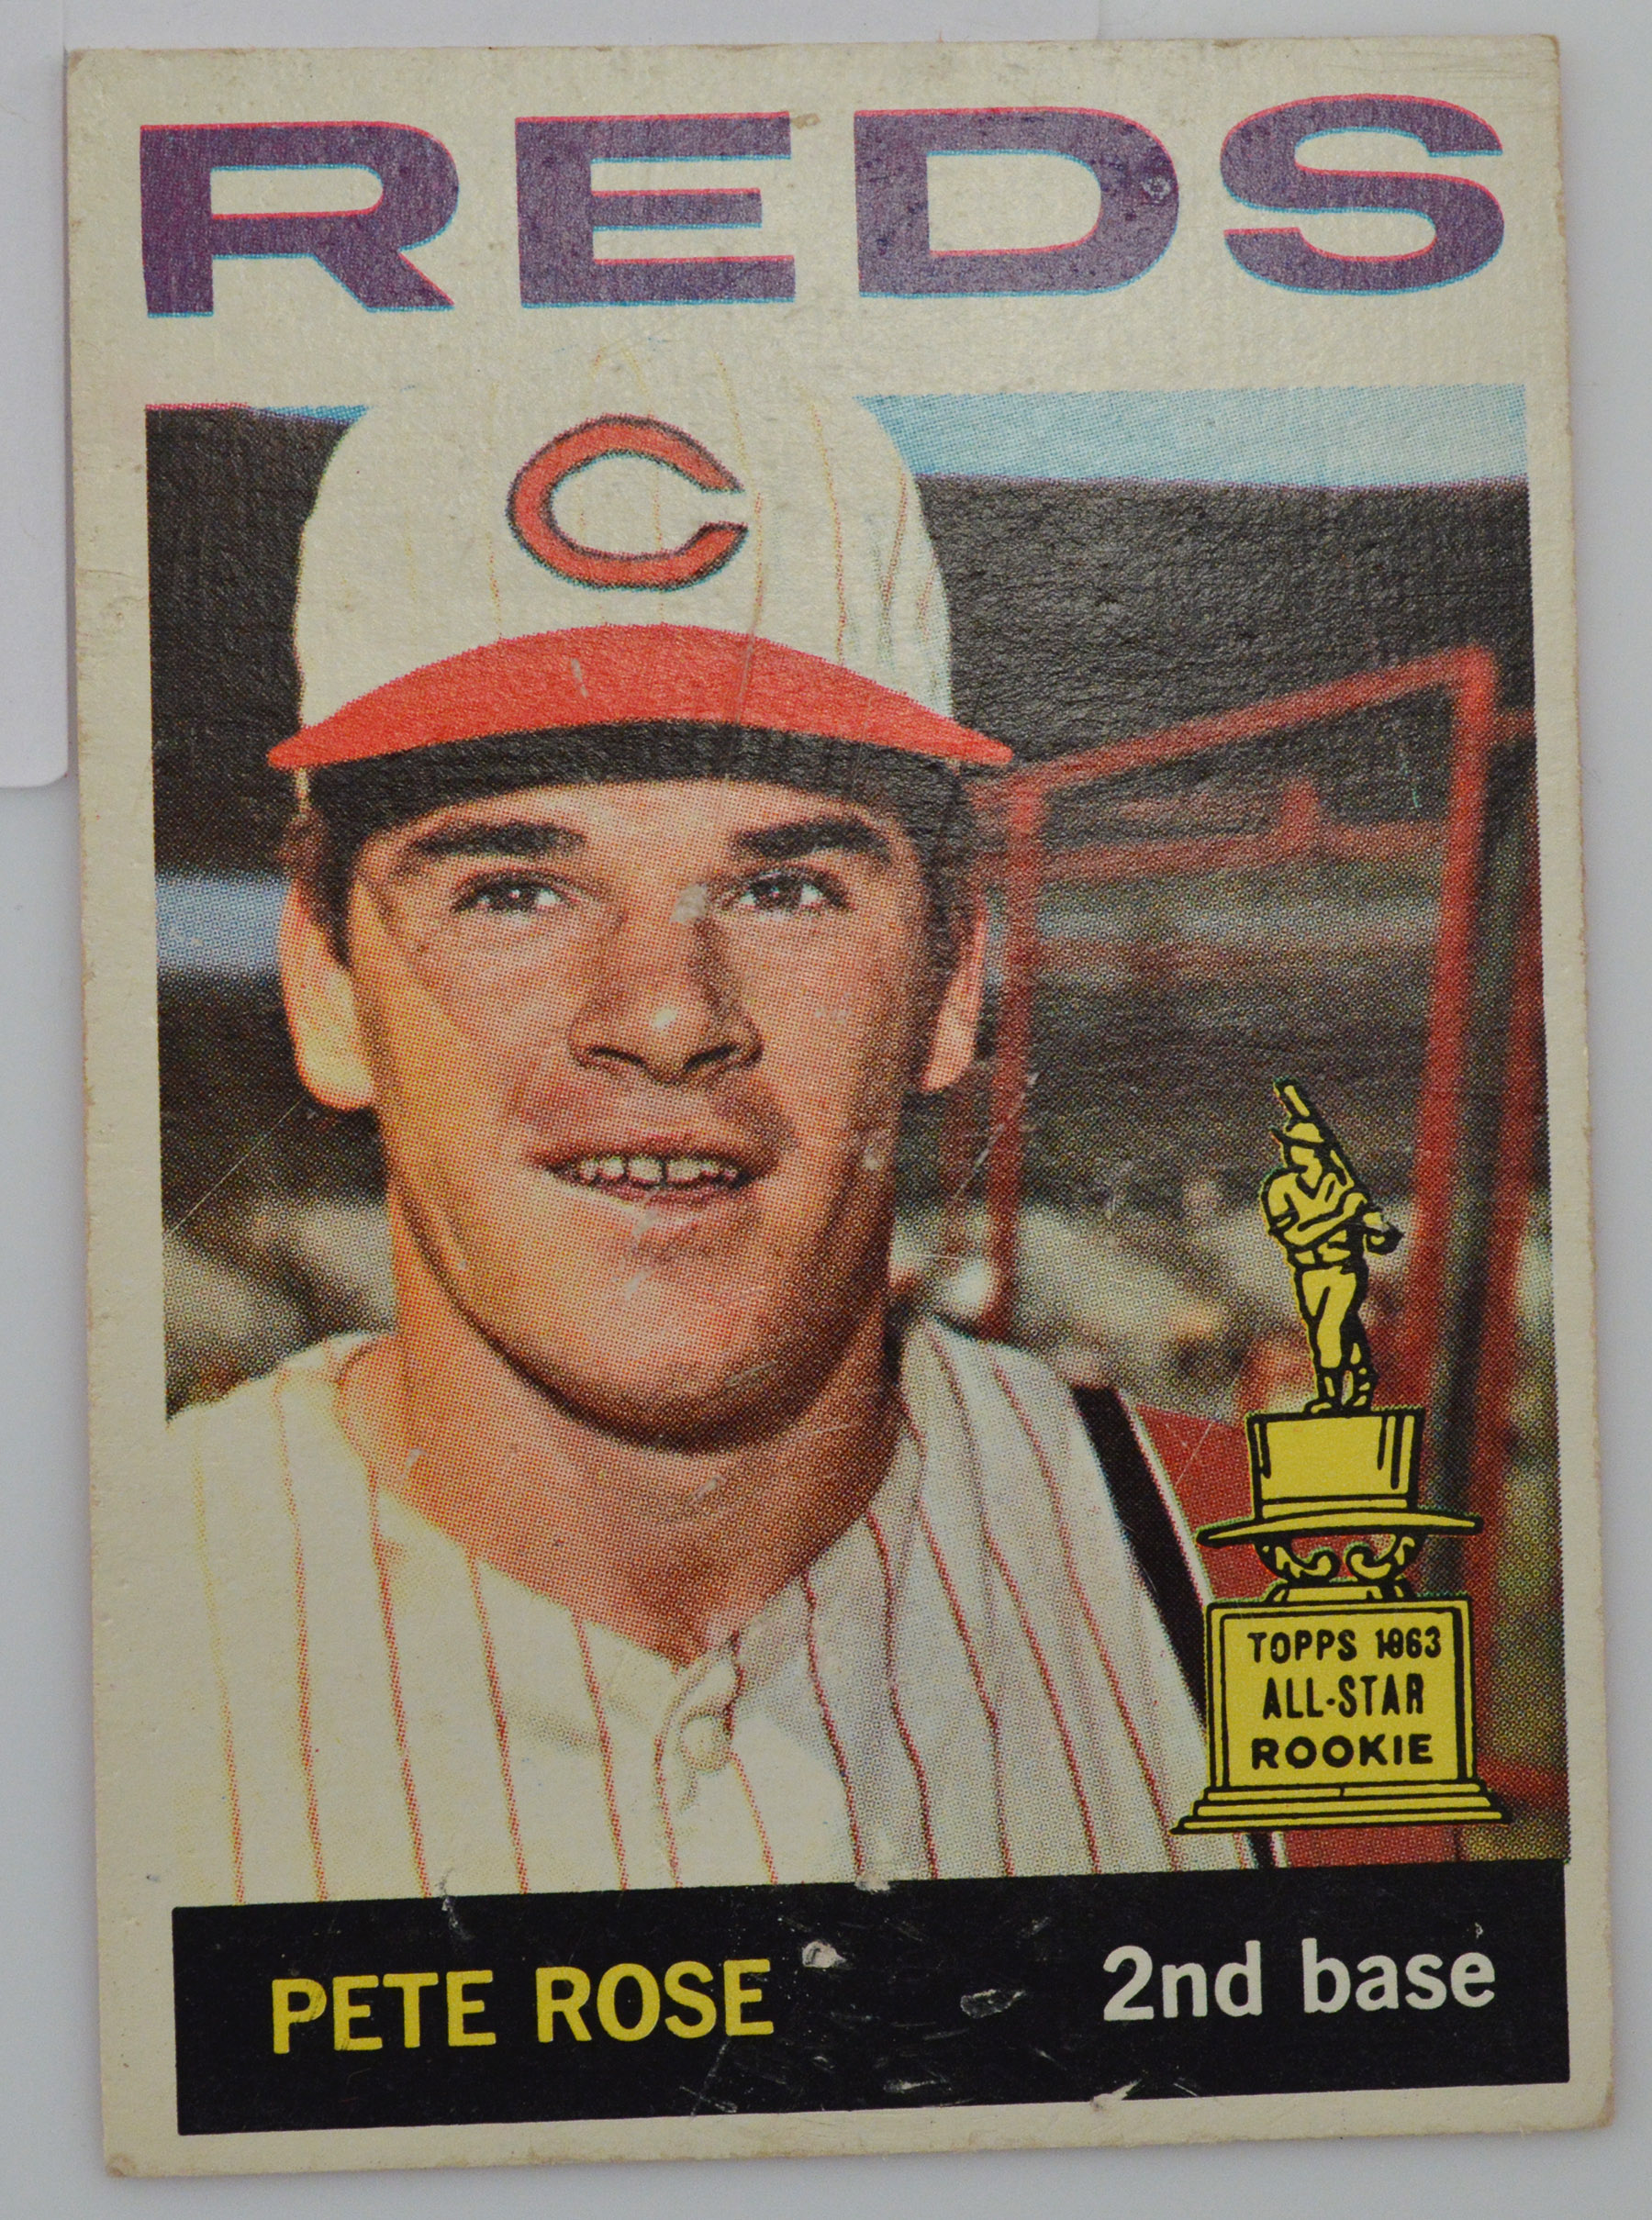 1963 Pete Rose Cincinnati Reds All Star Rookie Topps 125